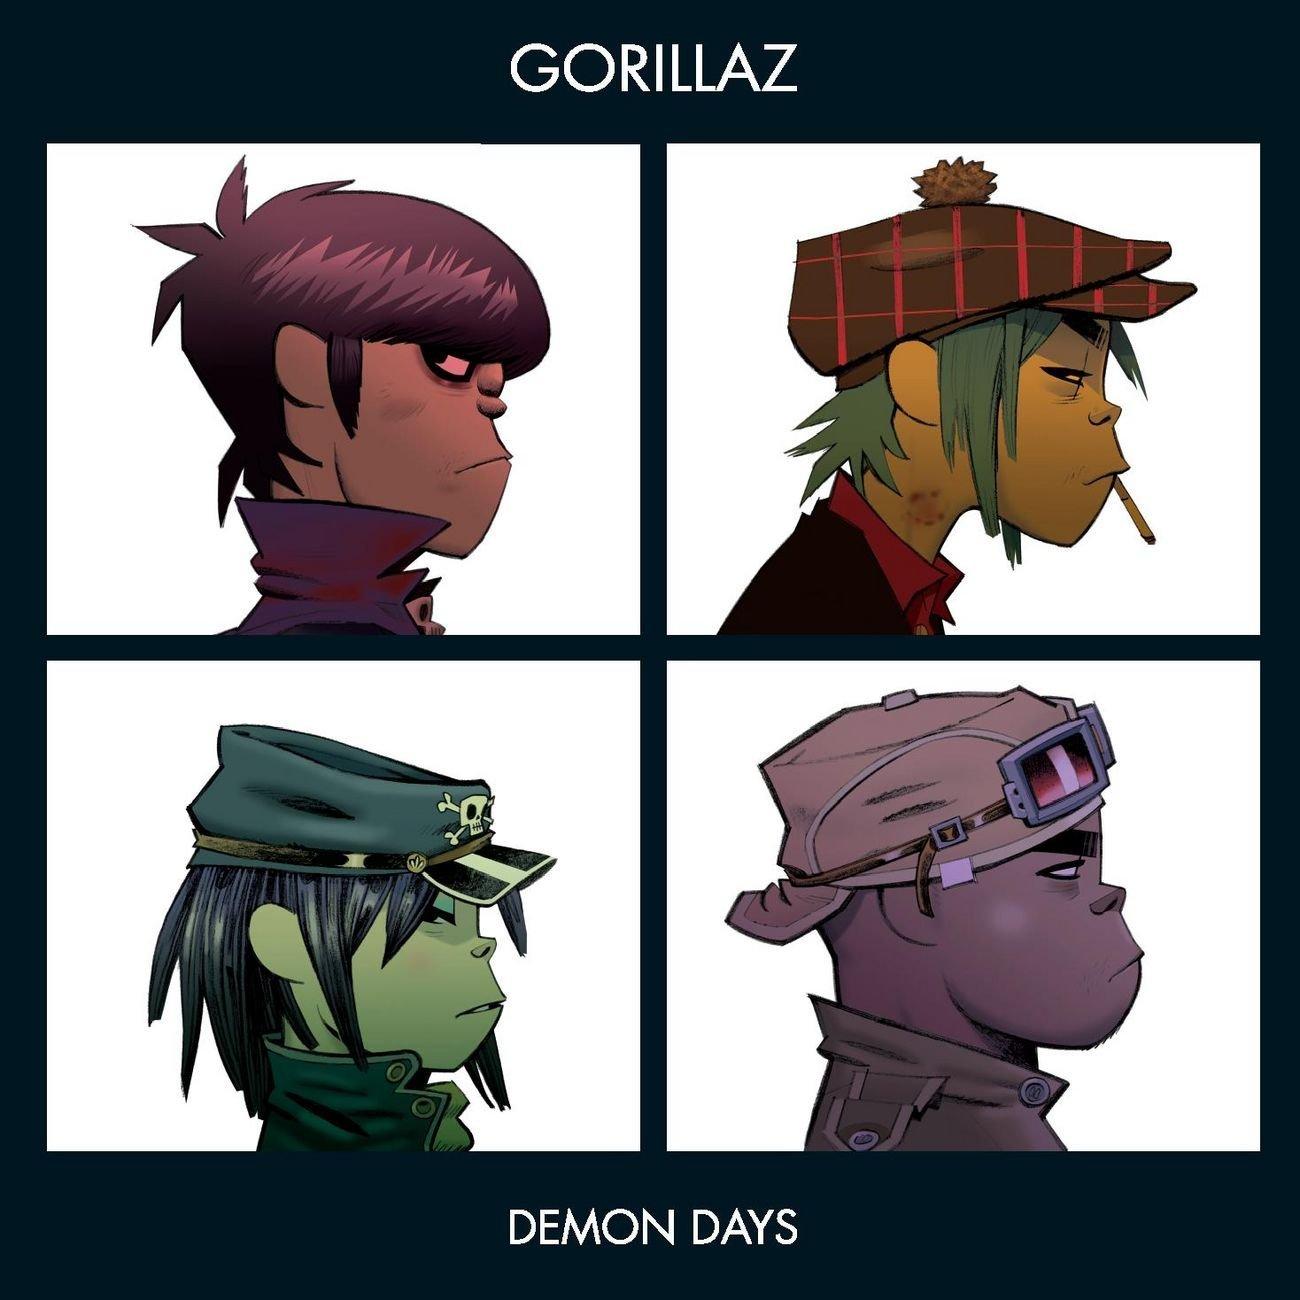 「November Has Come」収録アルバム『Demon Days』/Gorillaz